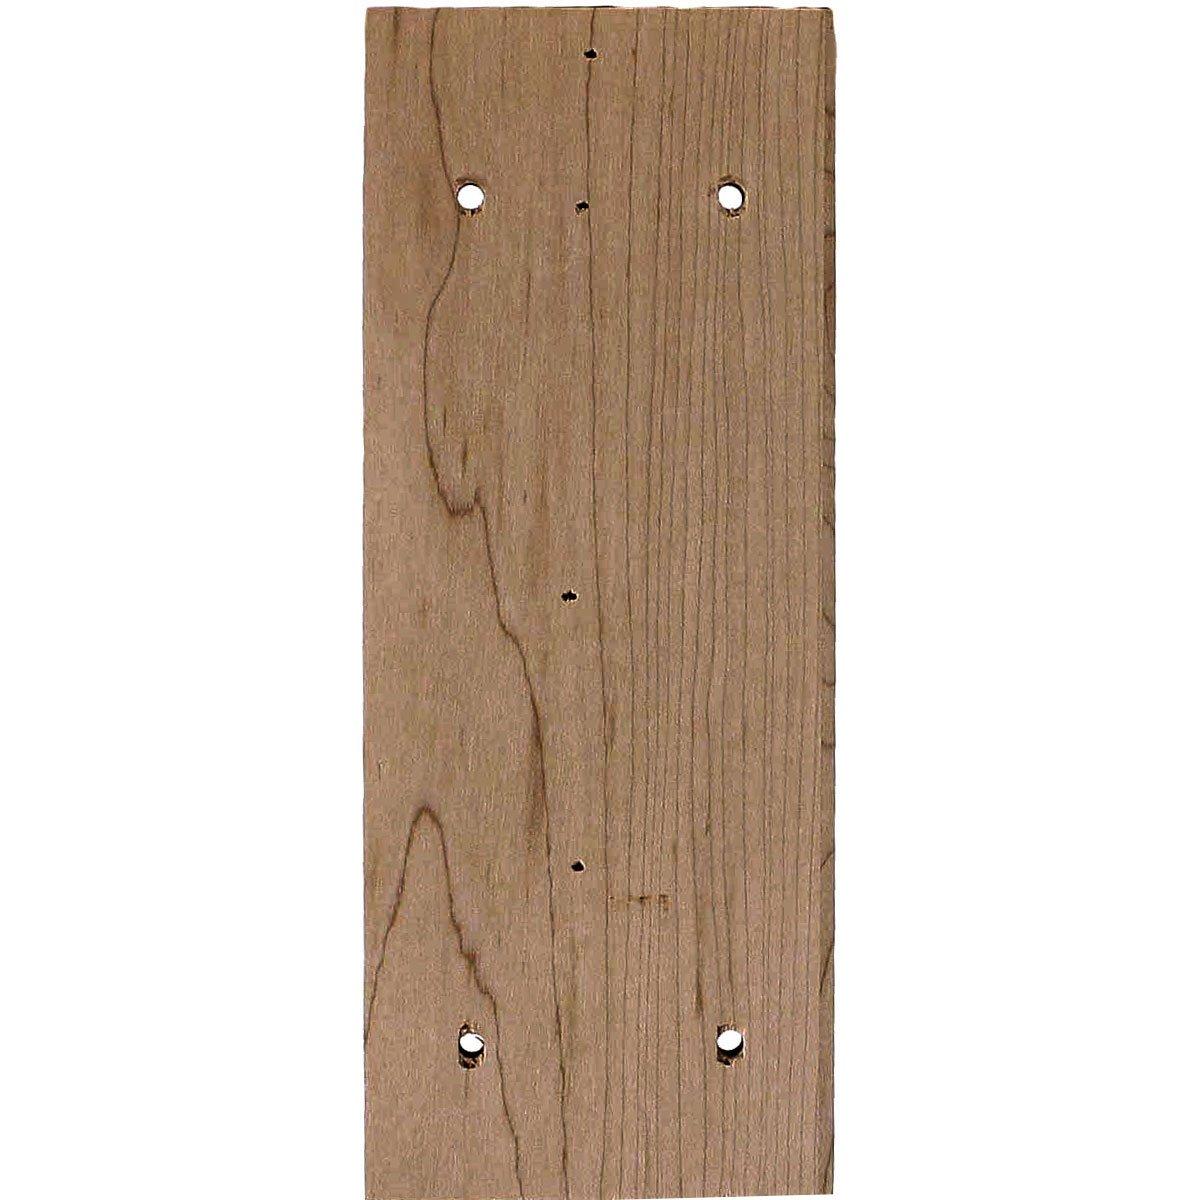 2-Pack , Red Oak Ekena Millwork BKT03X05X07HARO-CASE-2 3W x 5D x 7H Hamilton Traditional Bracket